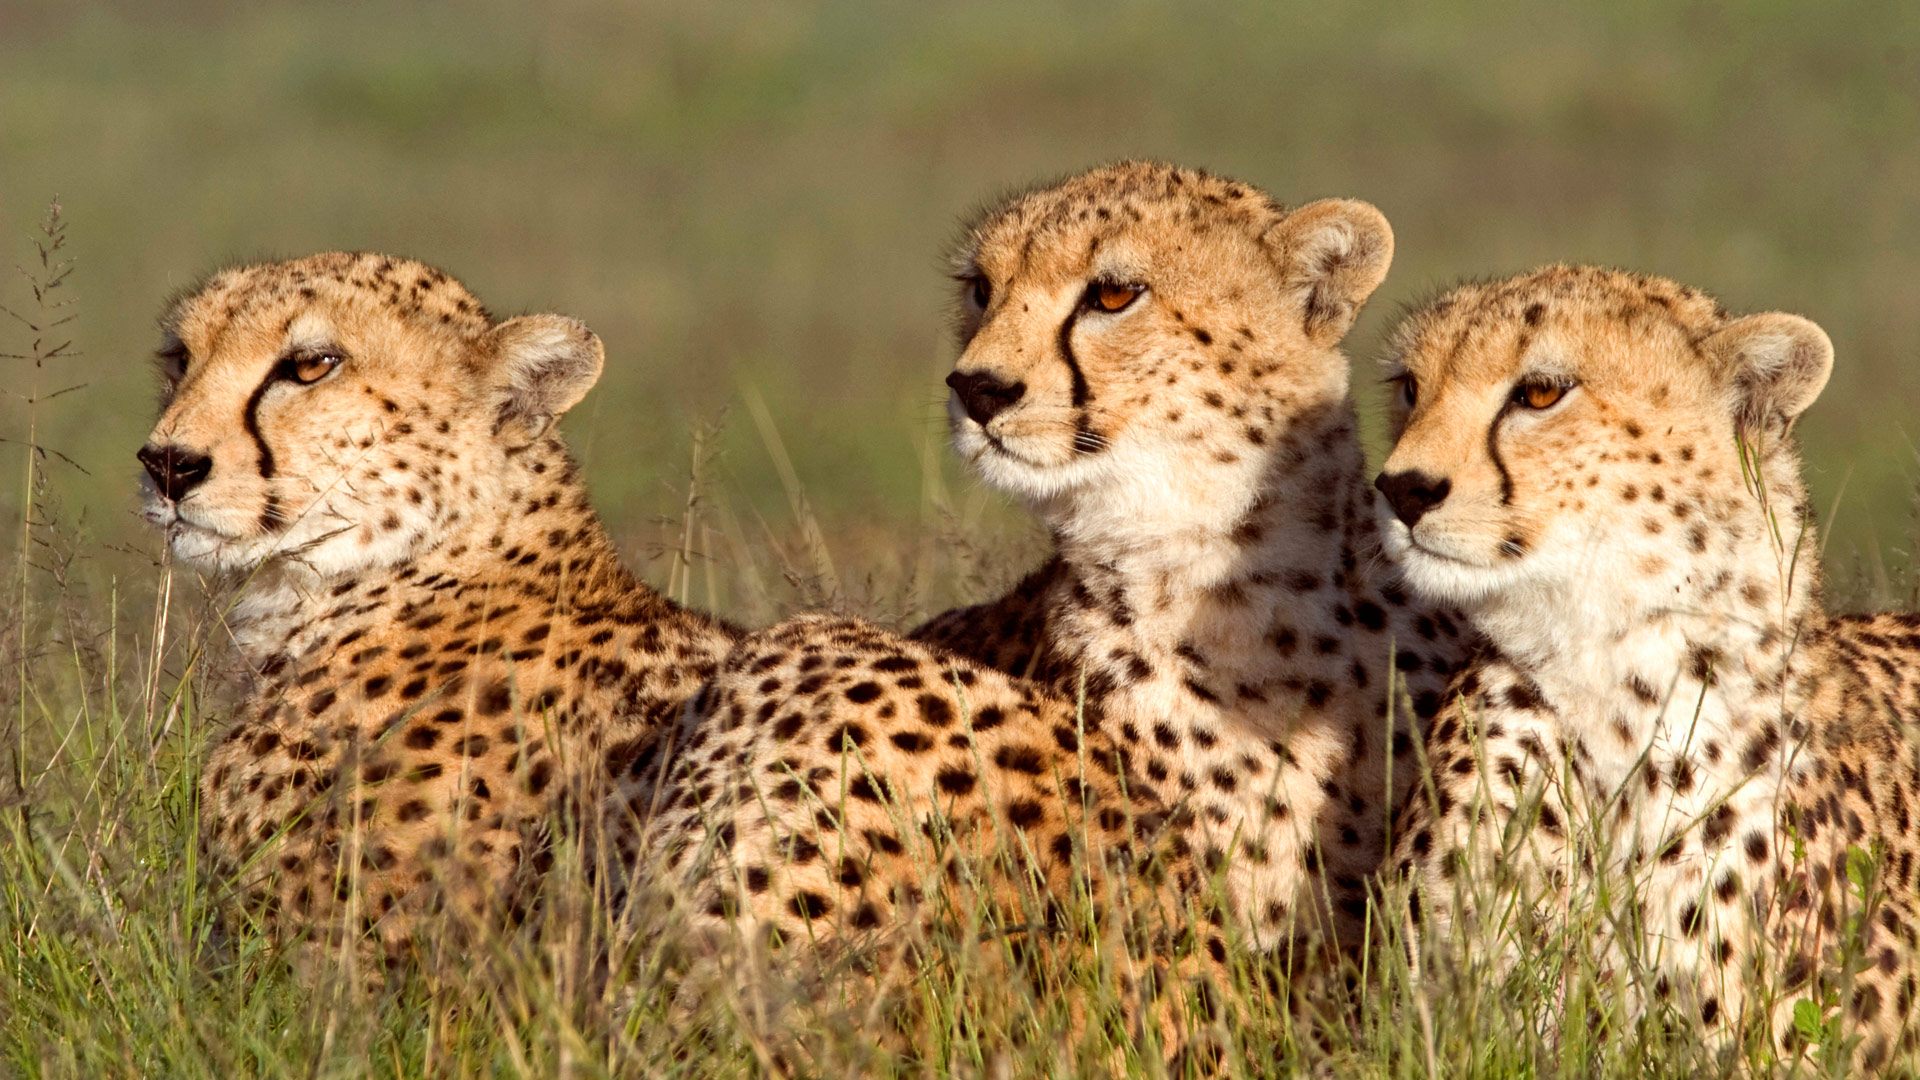 Cheetahs lying in grass, Tanzania.